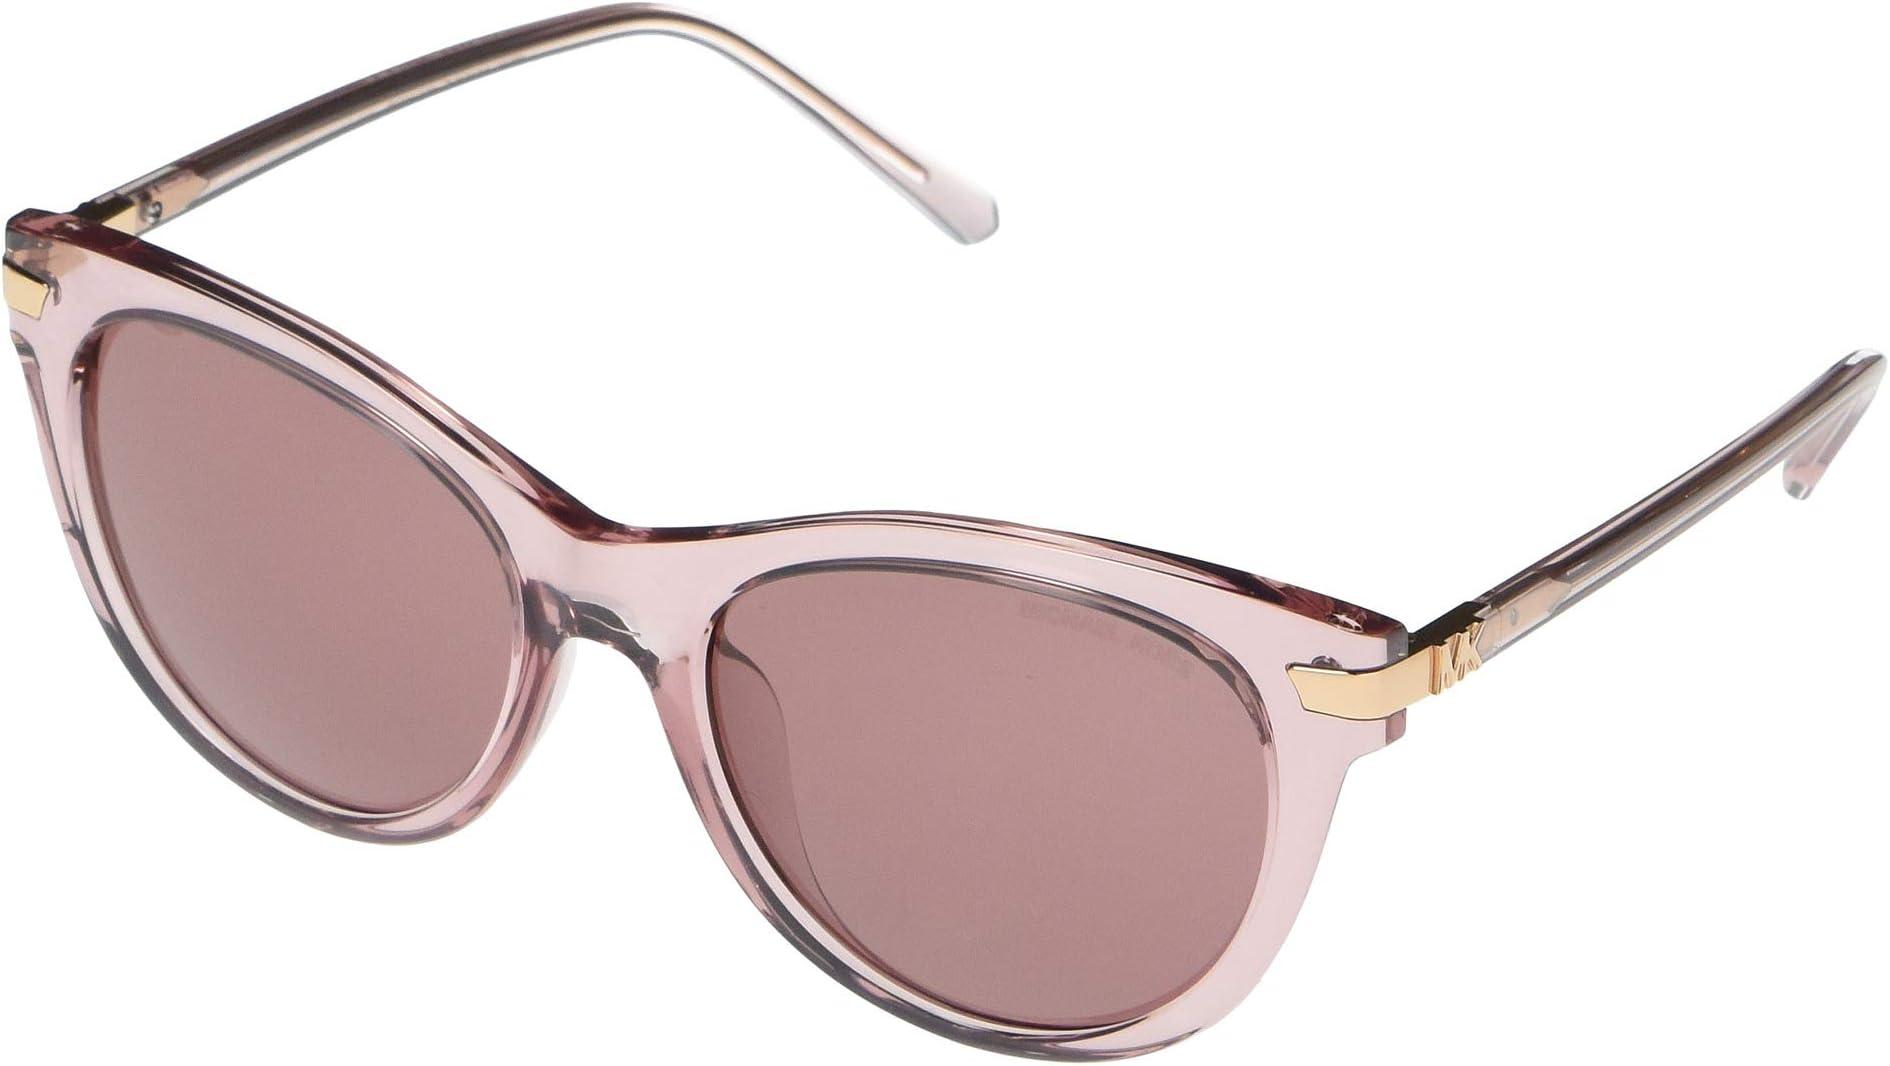 MMK Sunglasses